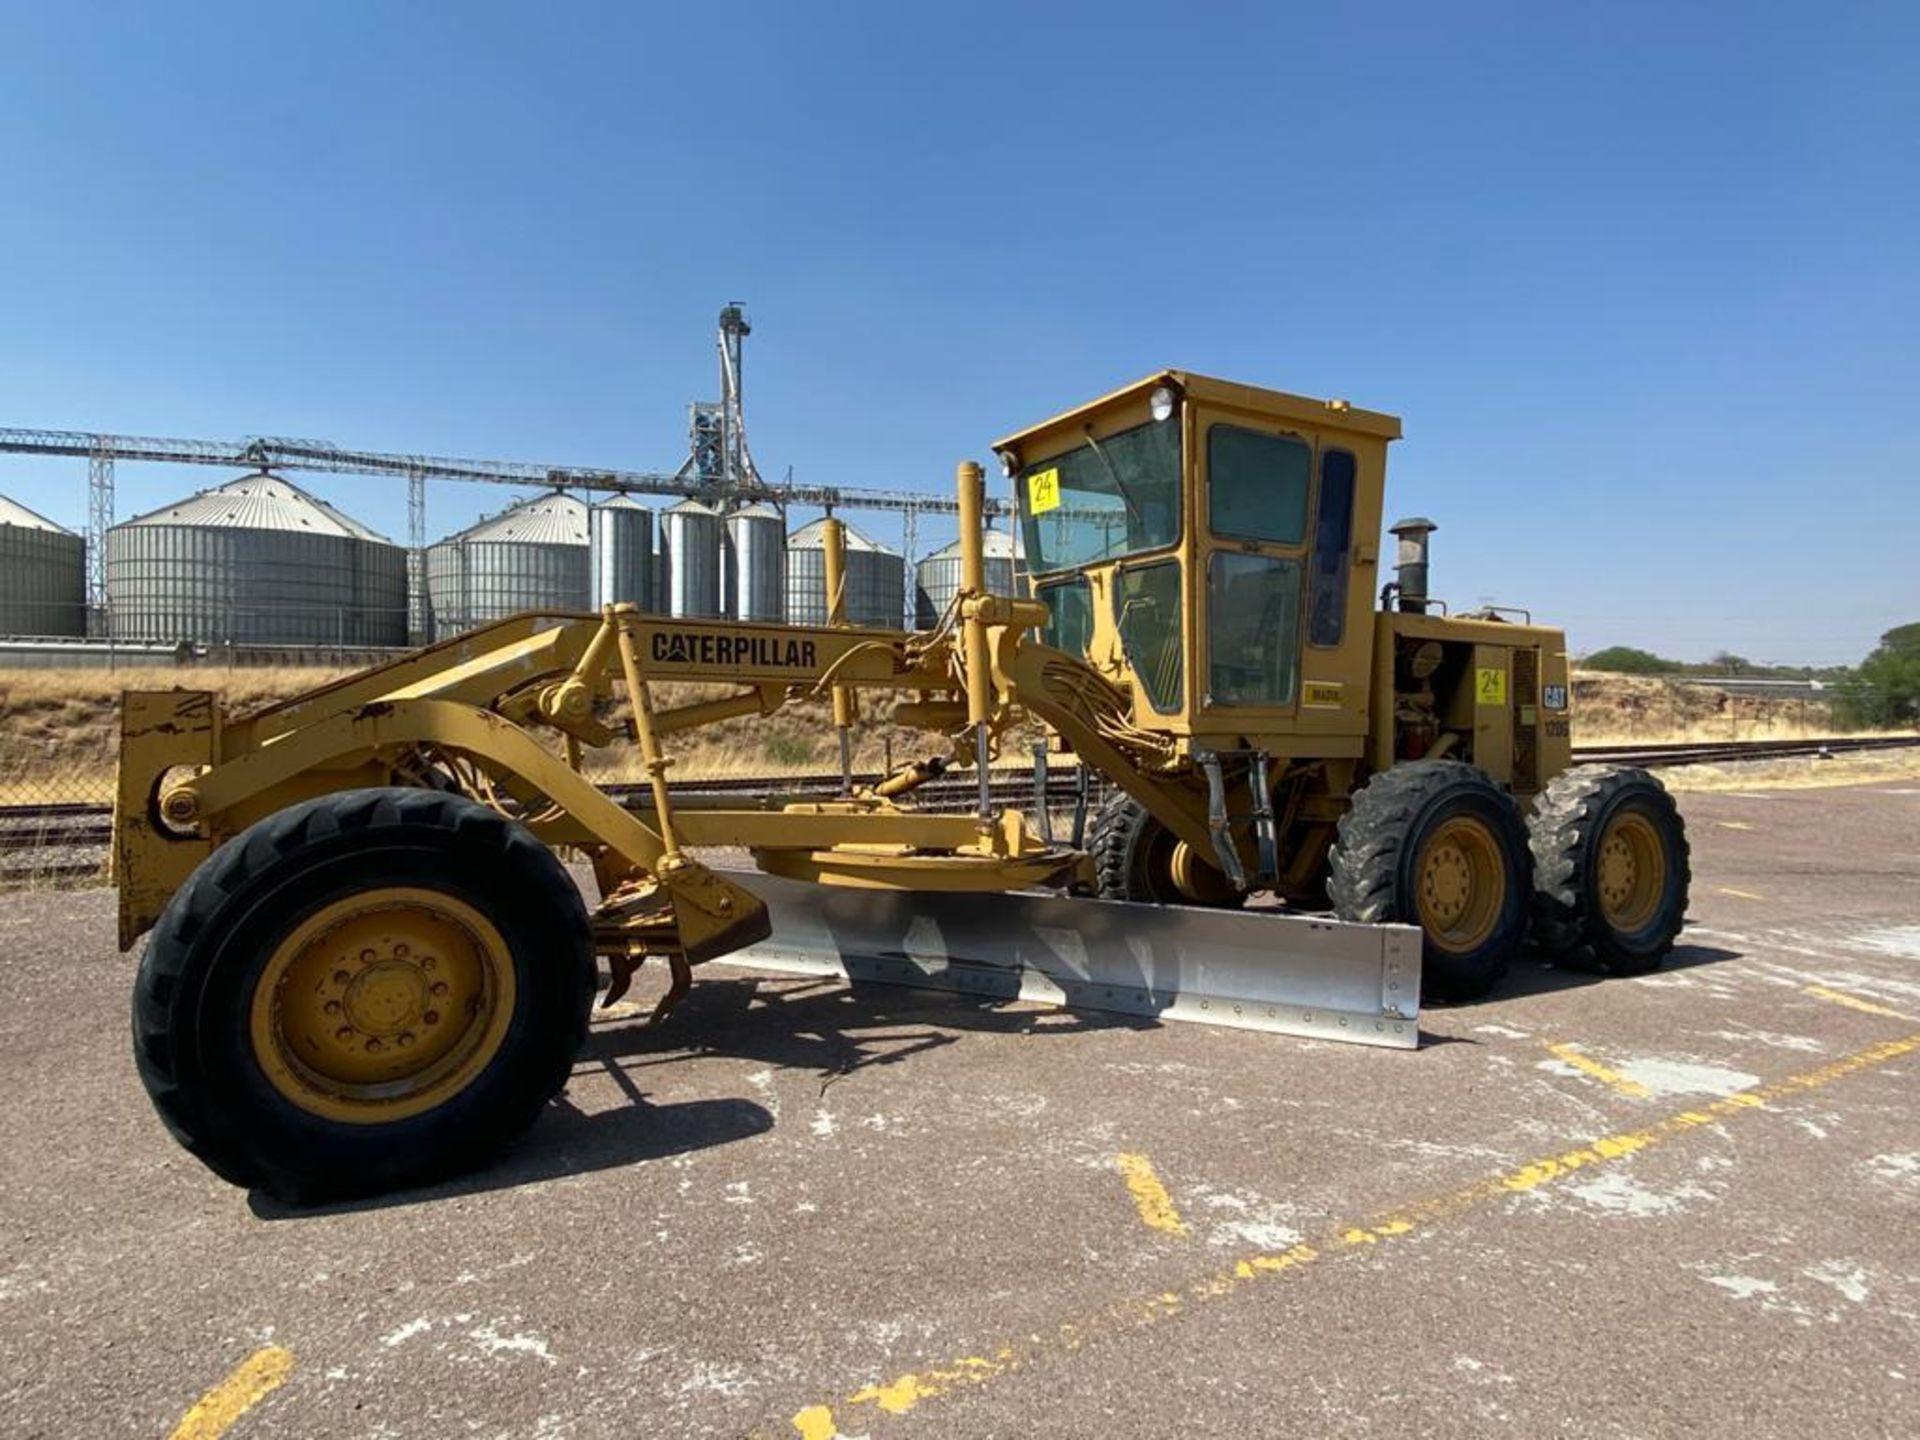 Caterpillar 120G Motor Grader, Serial number 87V09646, Motor number PQ883-2/07Z28983 - Image 6 of 61